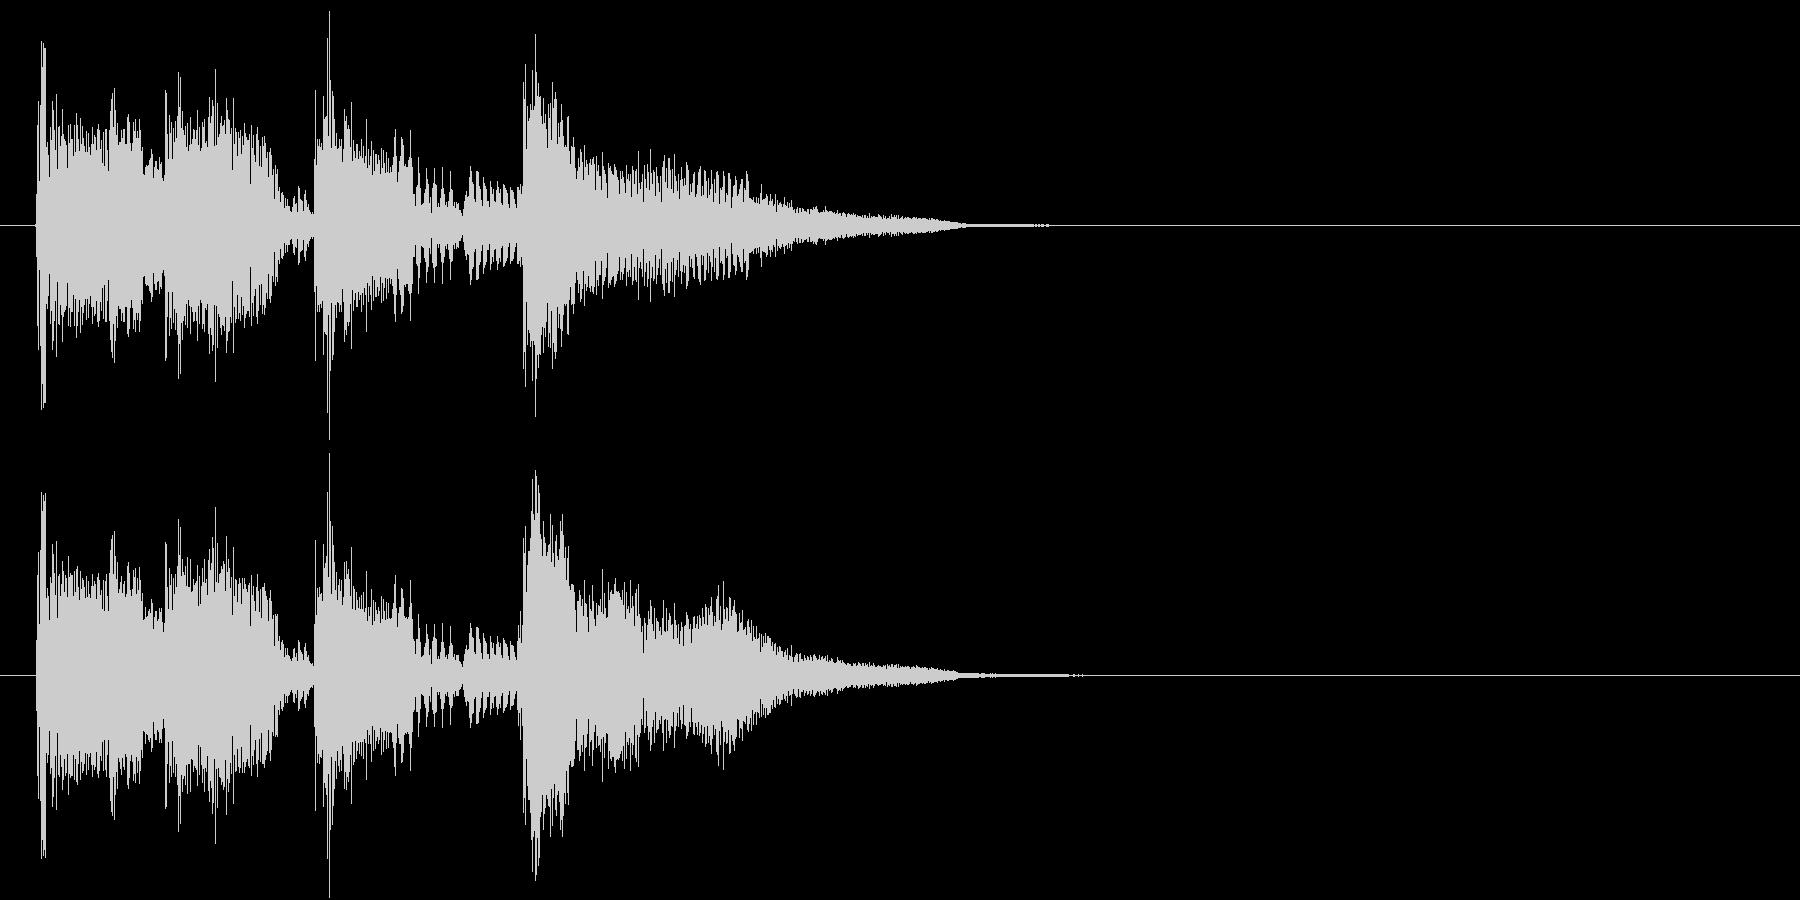 124bpm、G-Maj、2小節ジングルの未再生の波形